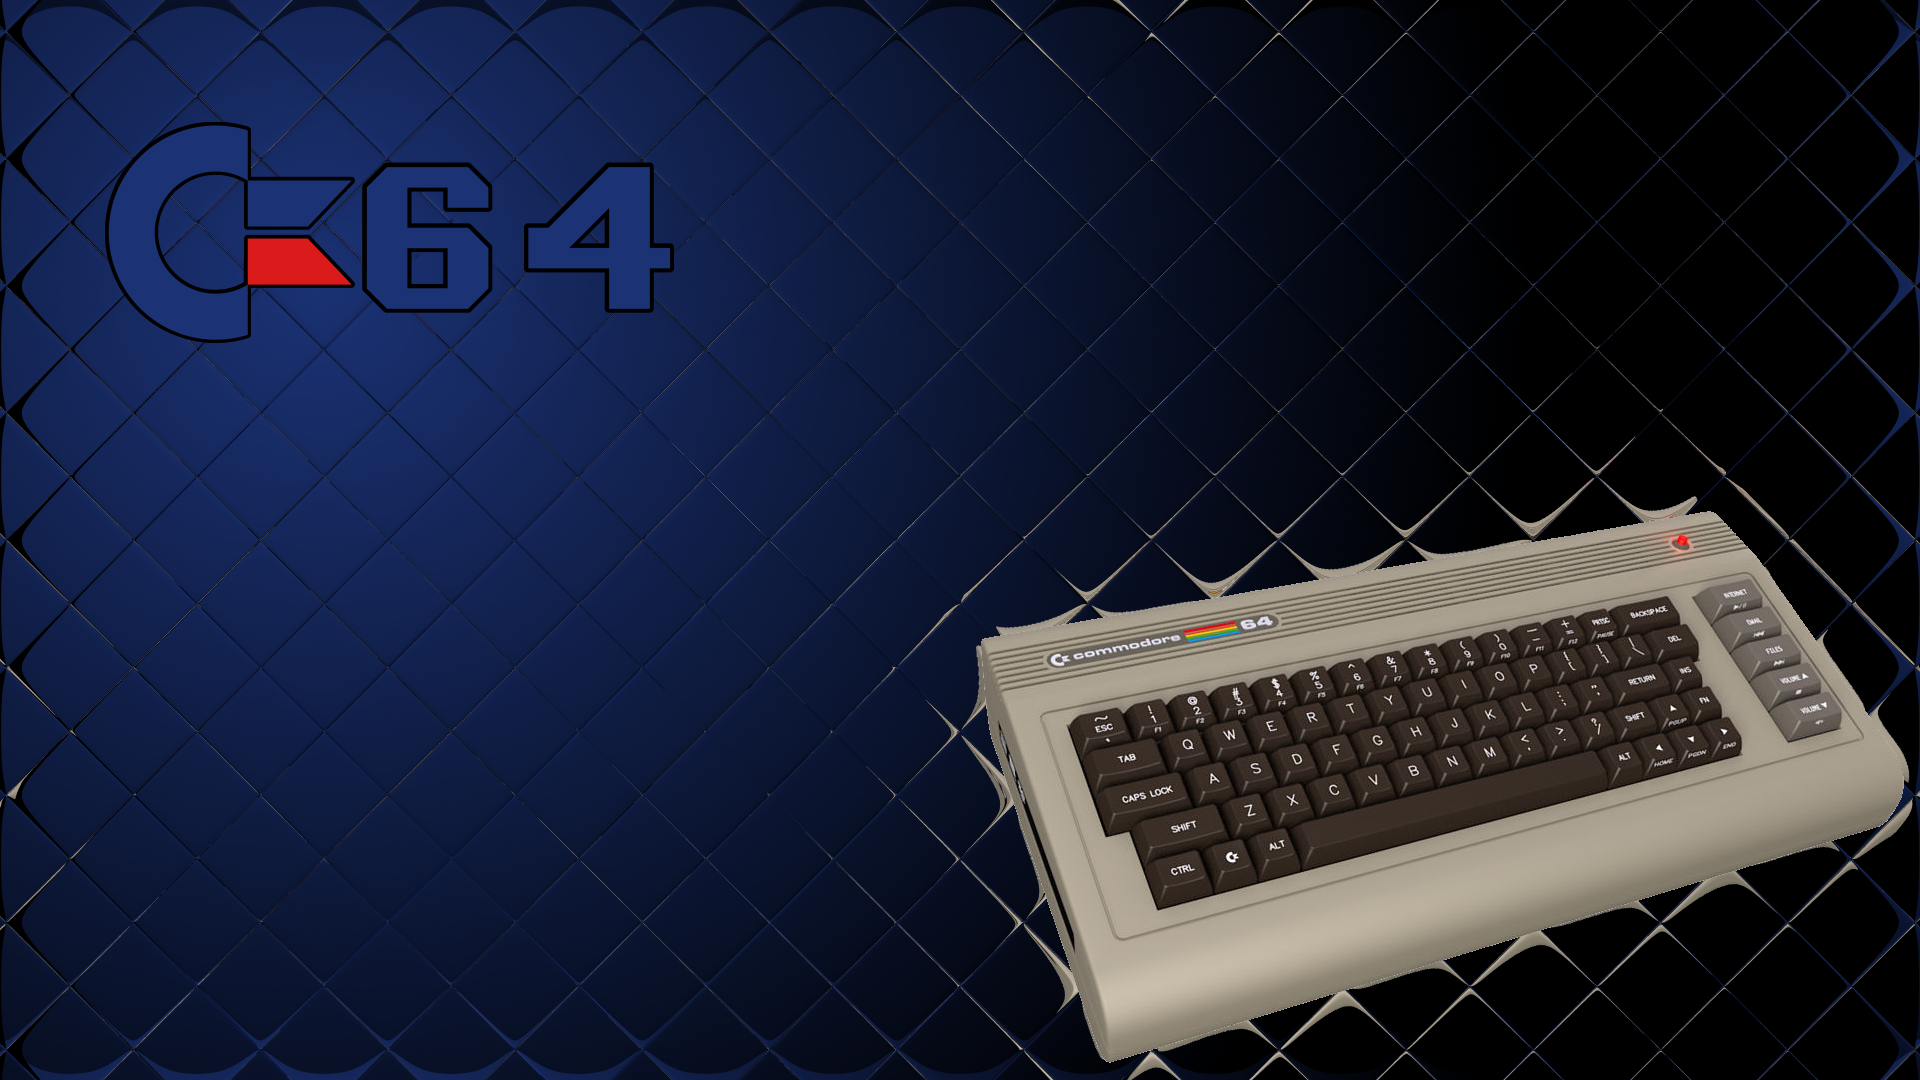 33 Years of C64 Wallpaper by WAtheAnum 1920x1080